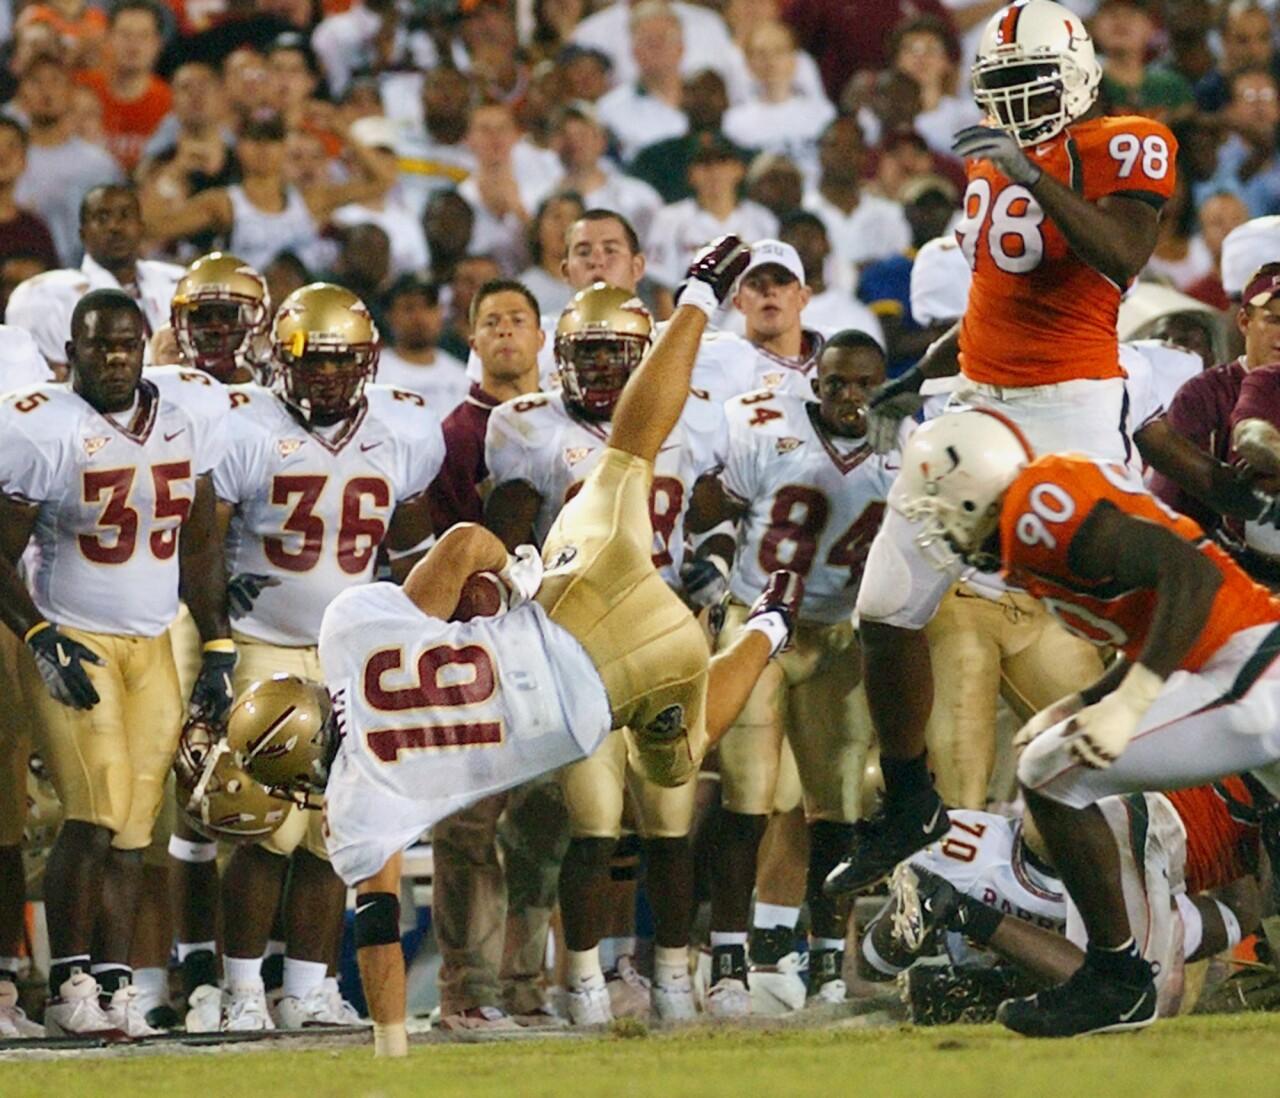 Florida State Seminoles QB Chris Rix leaps for yardage at Miami Hurricanes in 2004